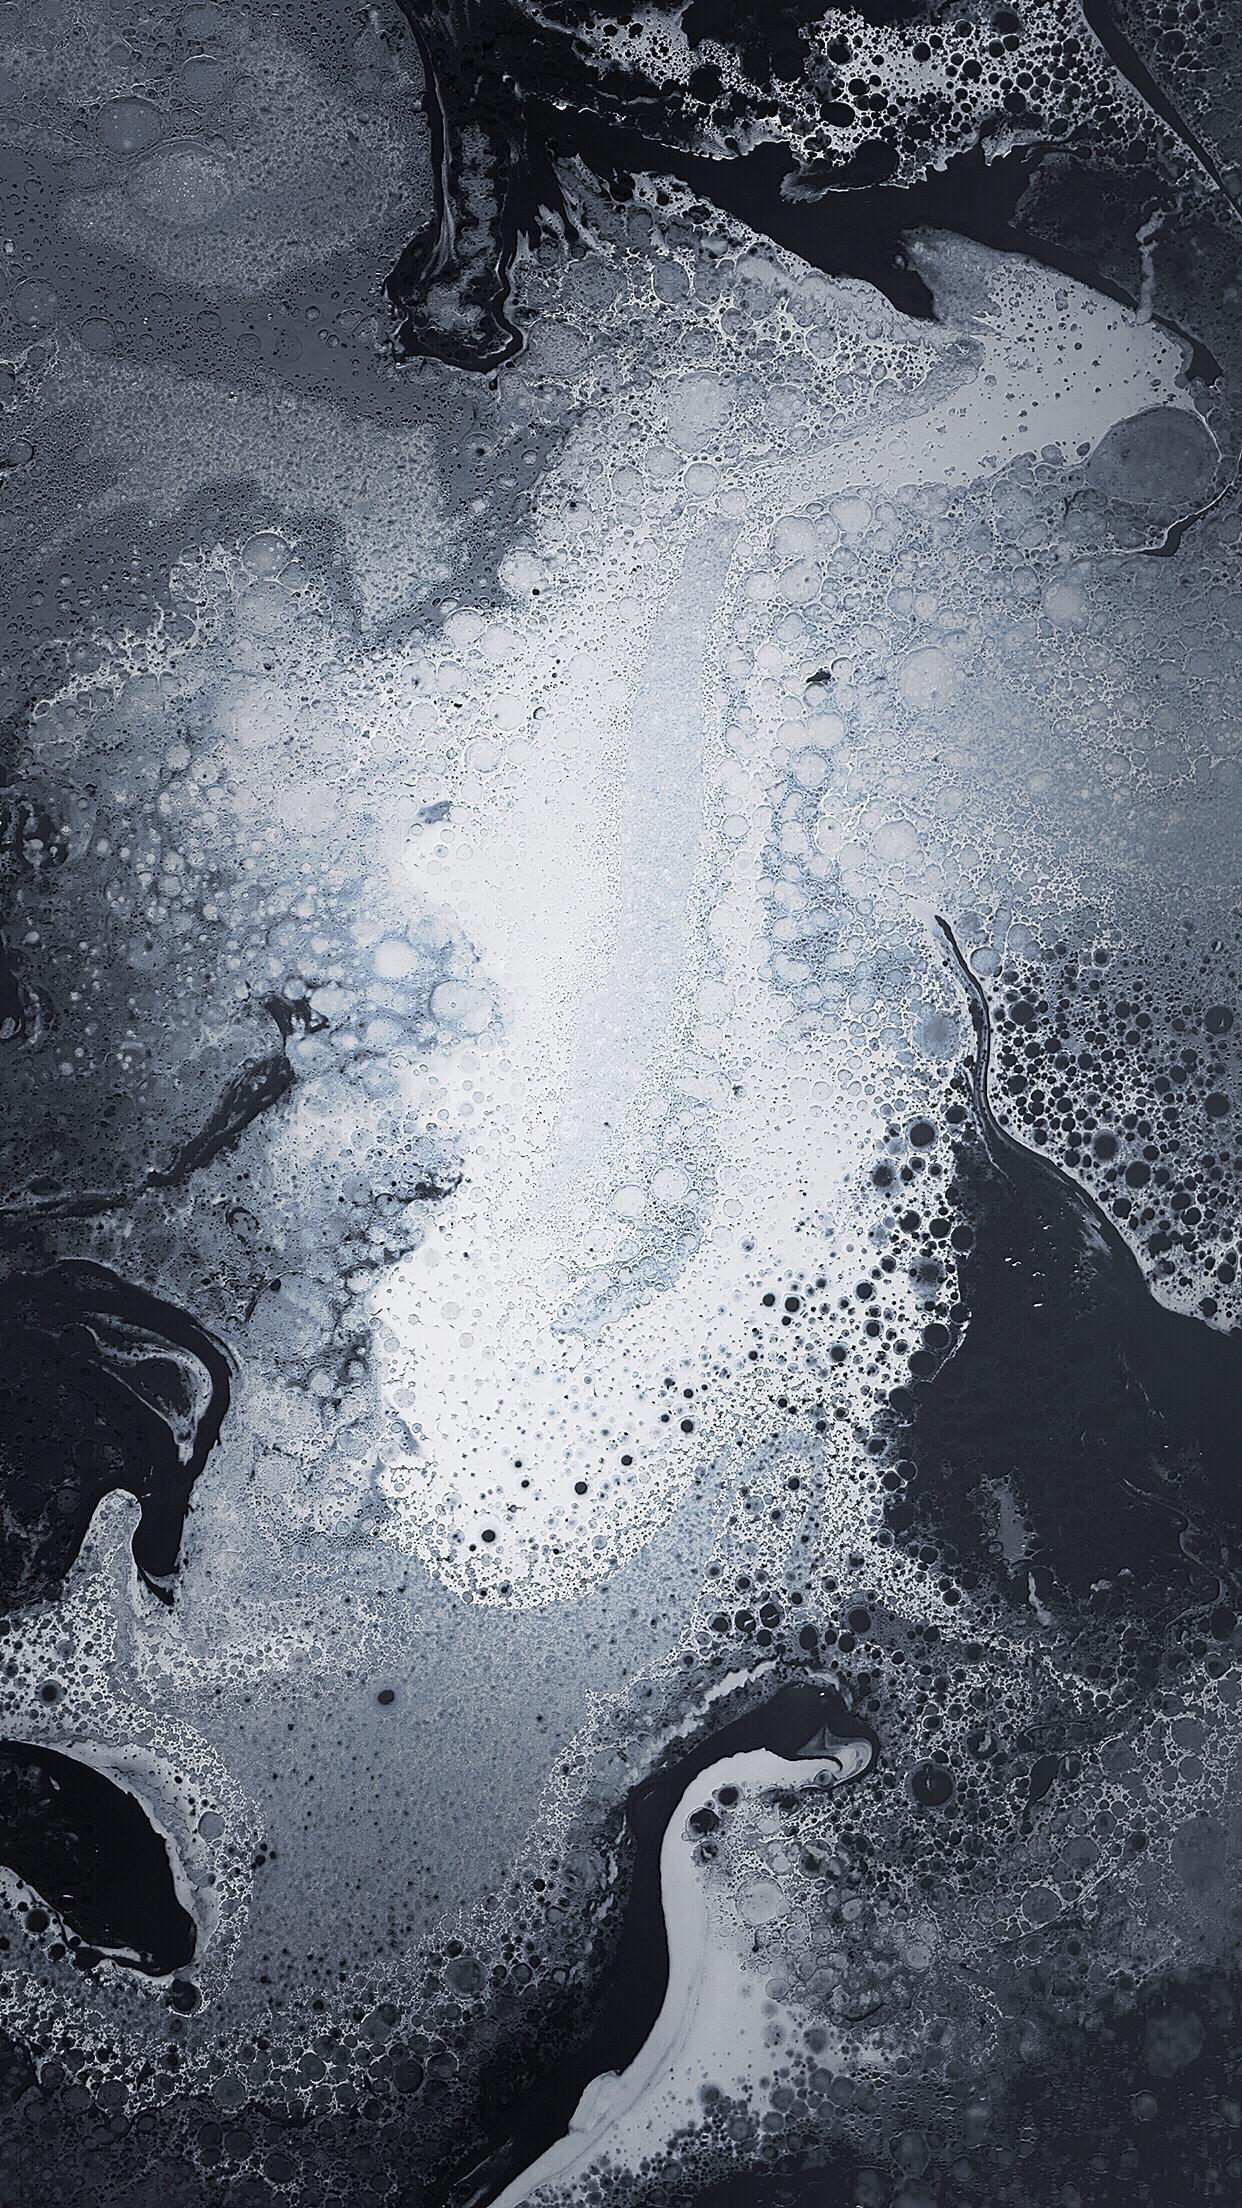 ar7-apple-iphone-7-wallpaper-dark-black-drip